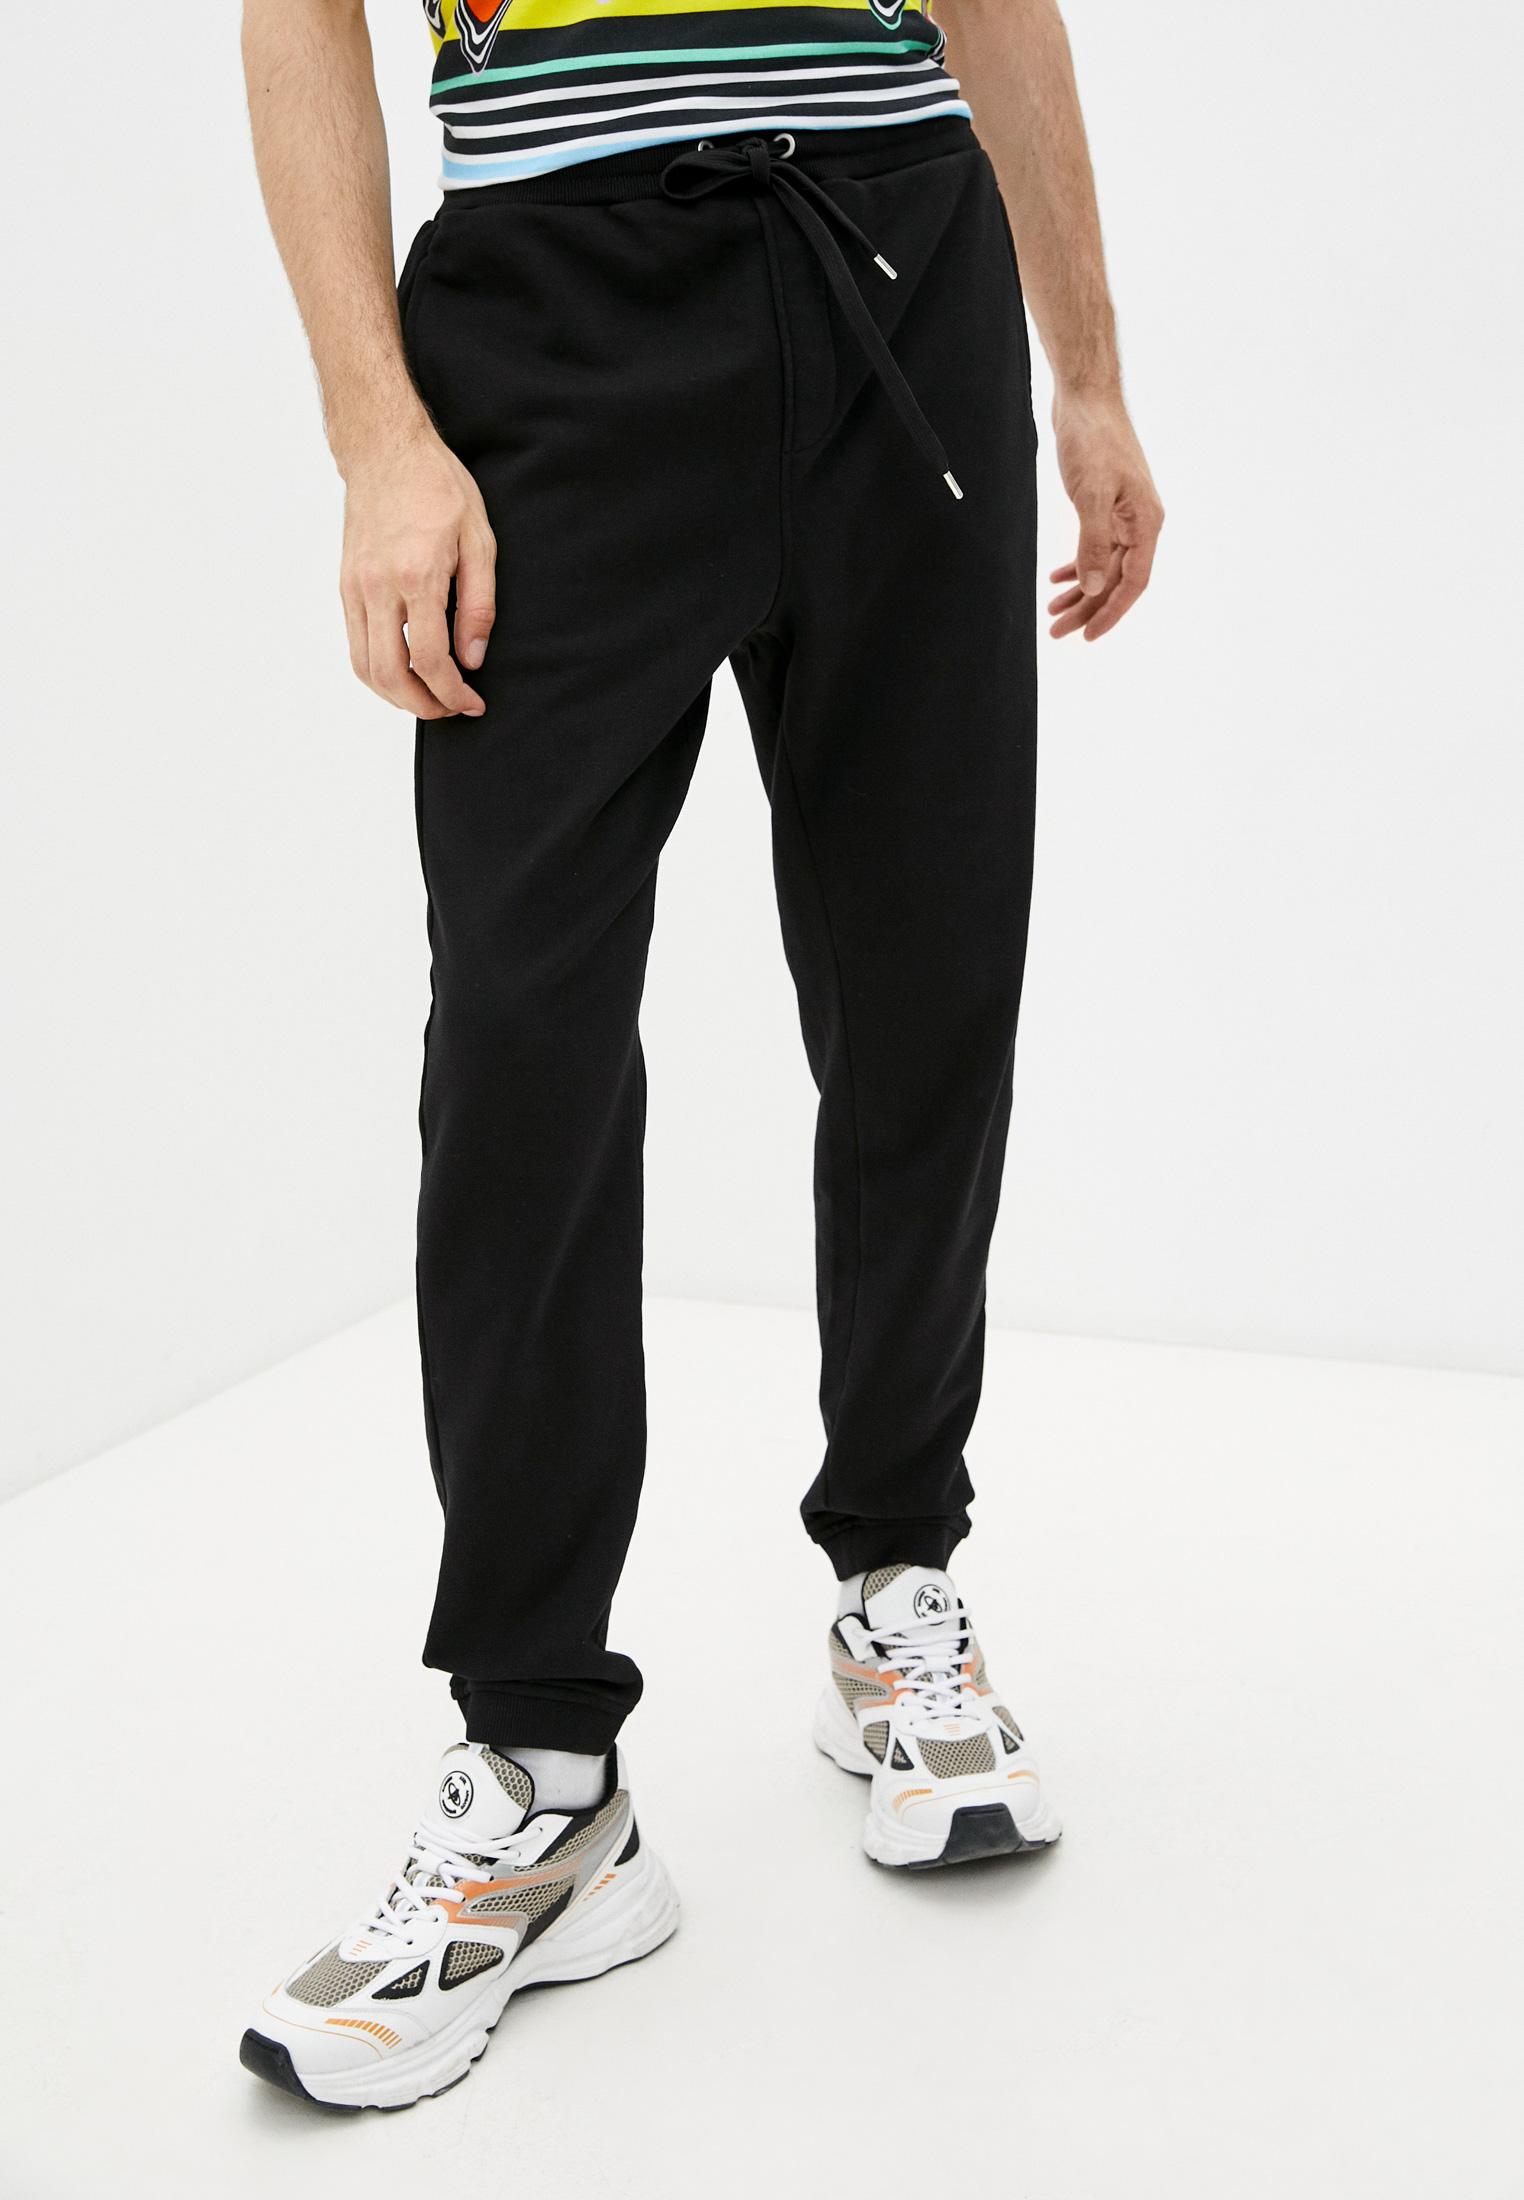 Мужские спортивные брюки Just Cavalli (Джаст Кавалли) S03KA0198 N25189